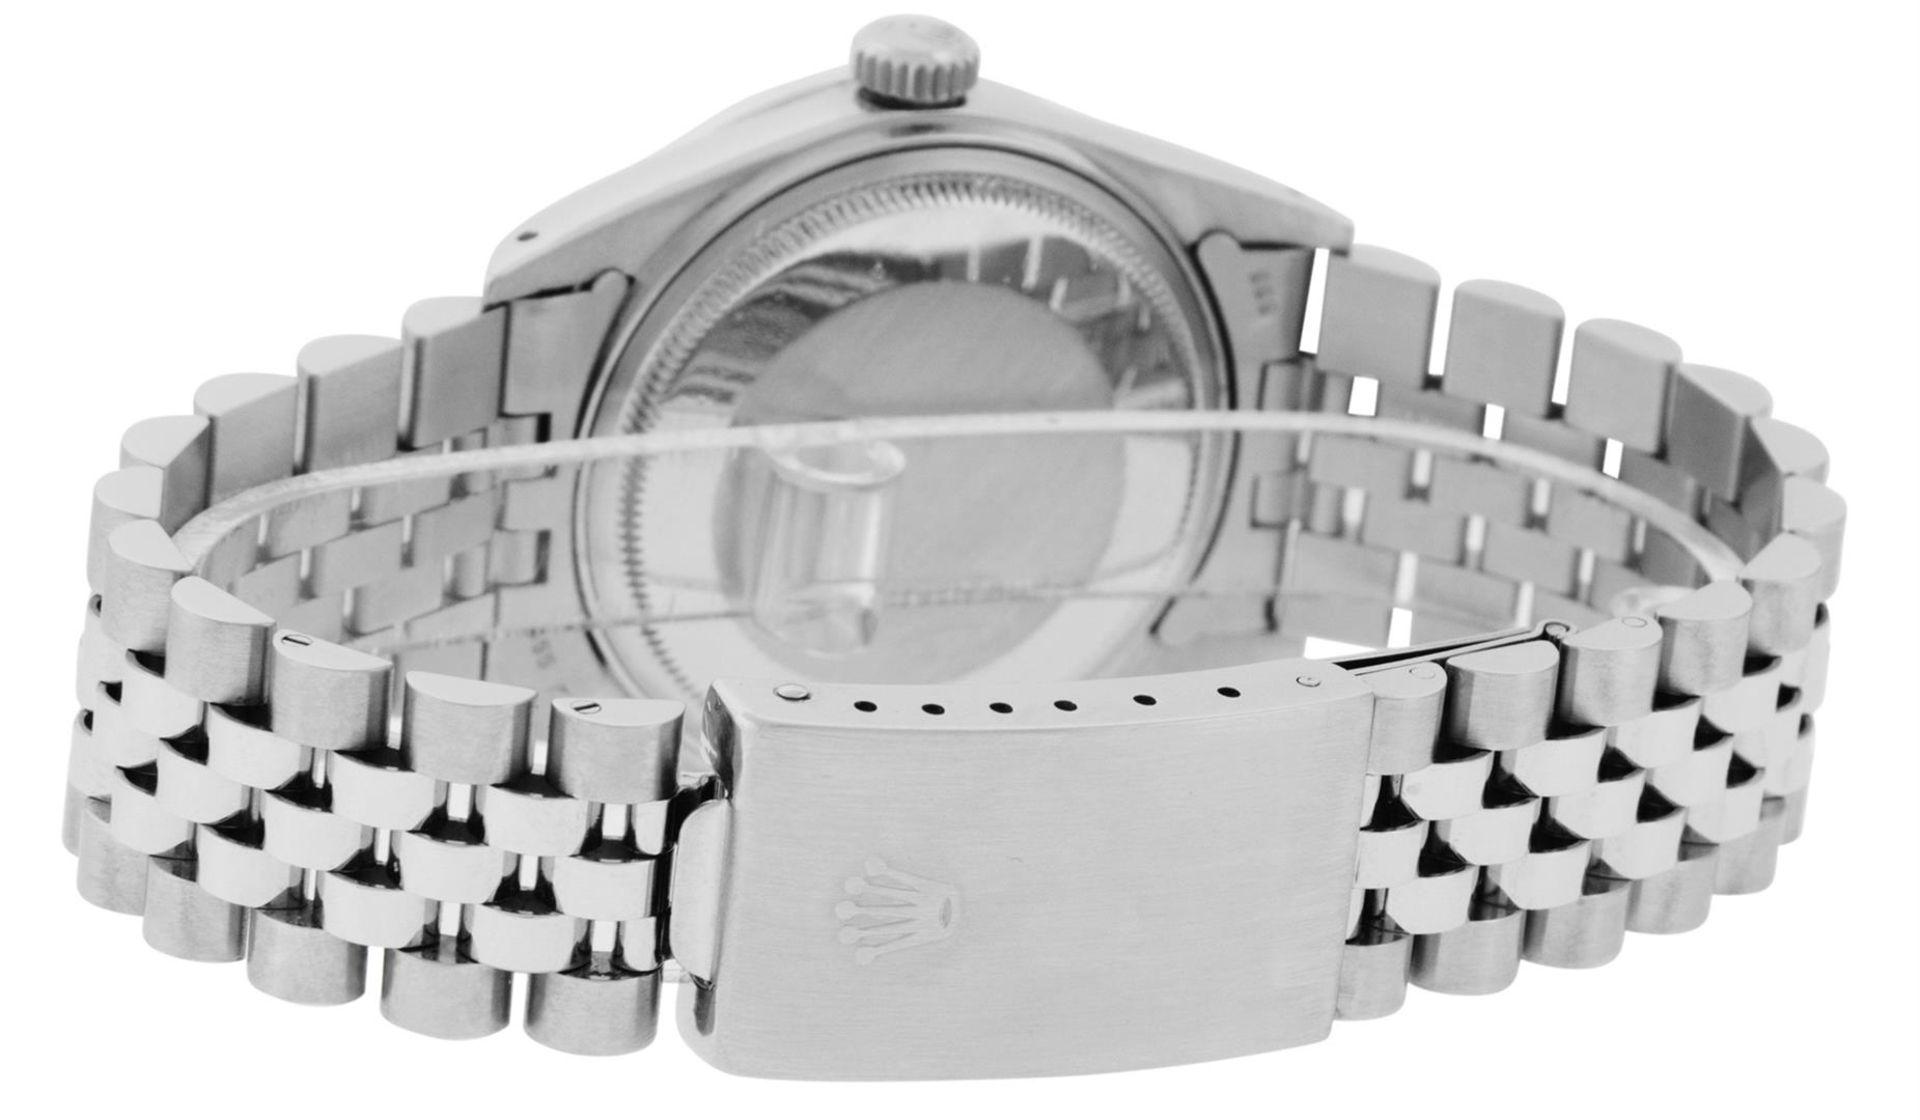 Rolex Mens Stainless Steel Black Diamond Lugs & Sapphire Datejust Wristwatch Oys - Image 5 of 9